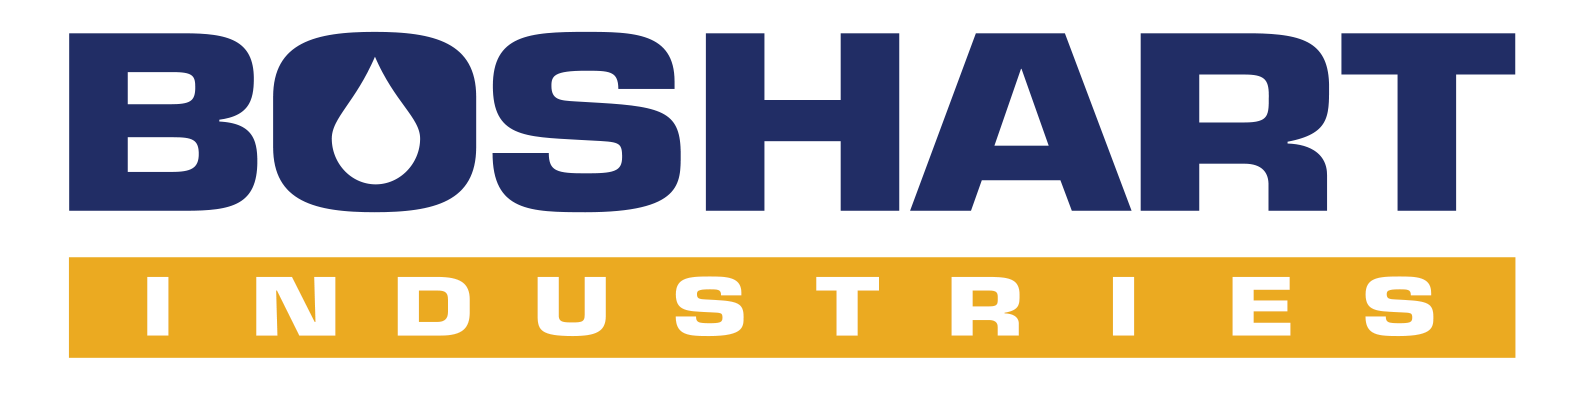 2018-Boshart-Industries-Logo-01-1